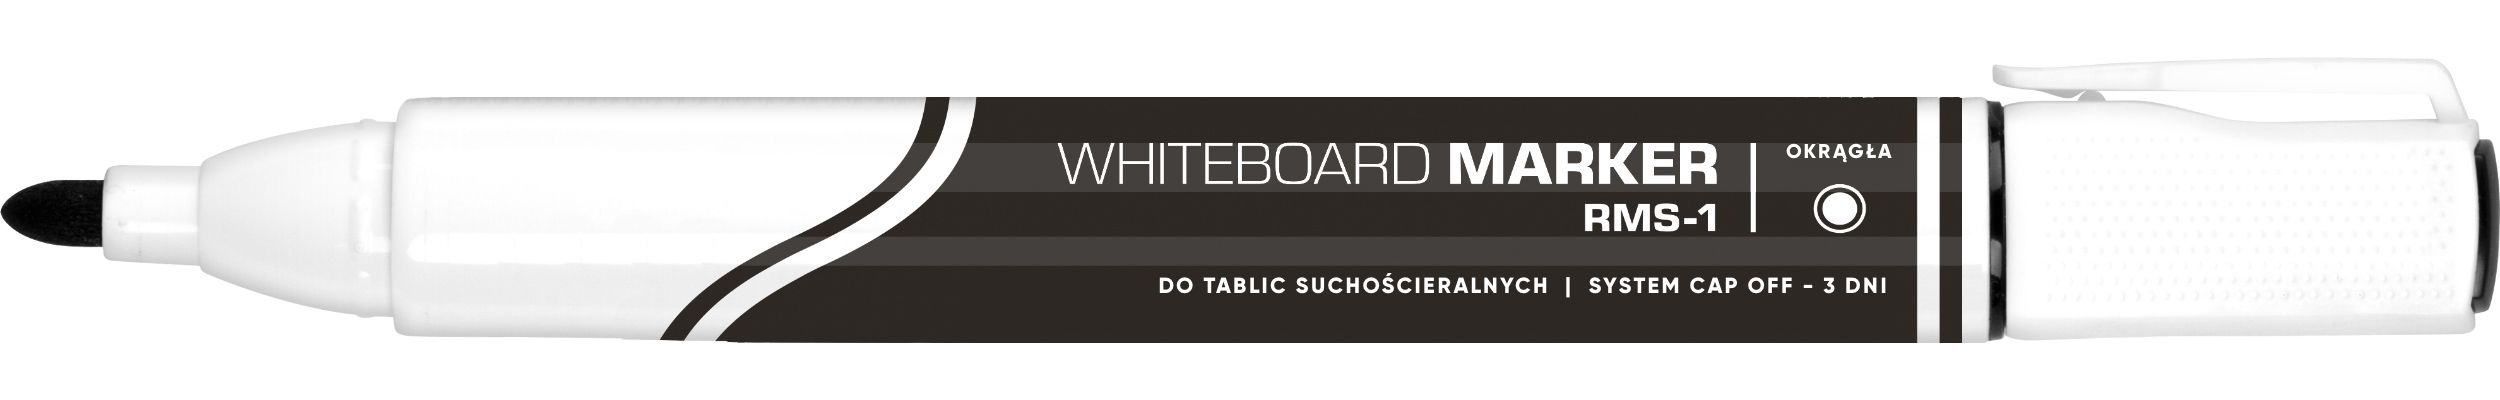 Whiteboard marker RMS-1